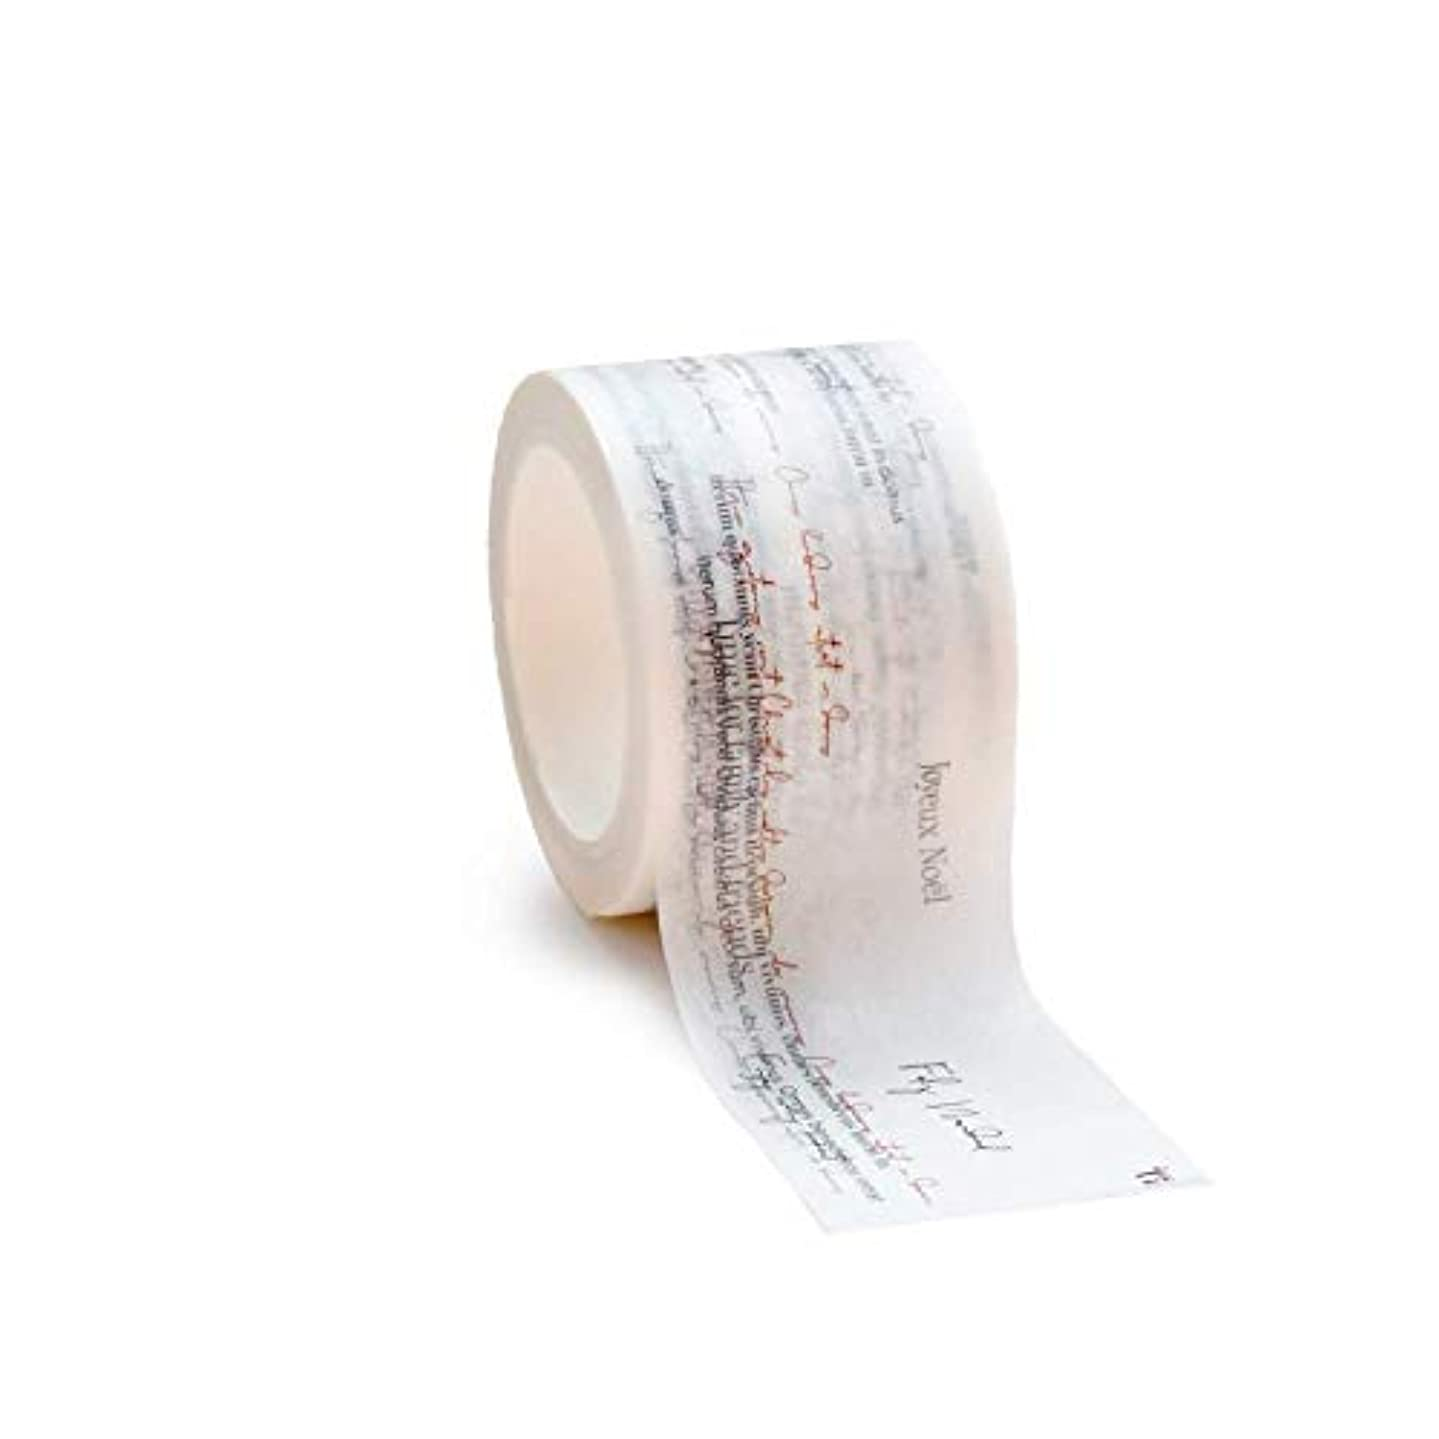 alexandraRenke Wt-AR-W0020 Christmas Typo Christmas Washi Tape, Paper, Grey-Red, 4.5 cm